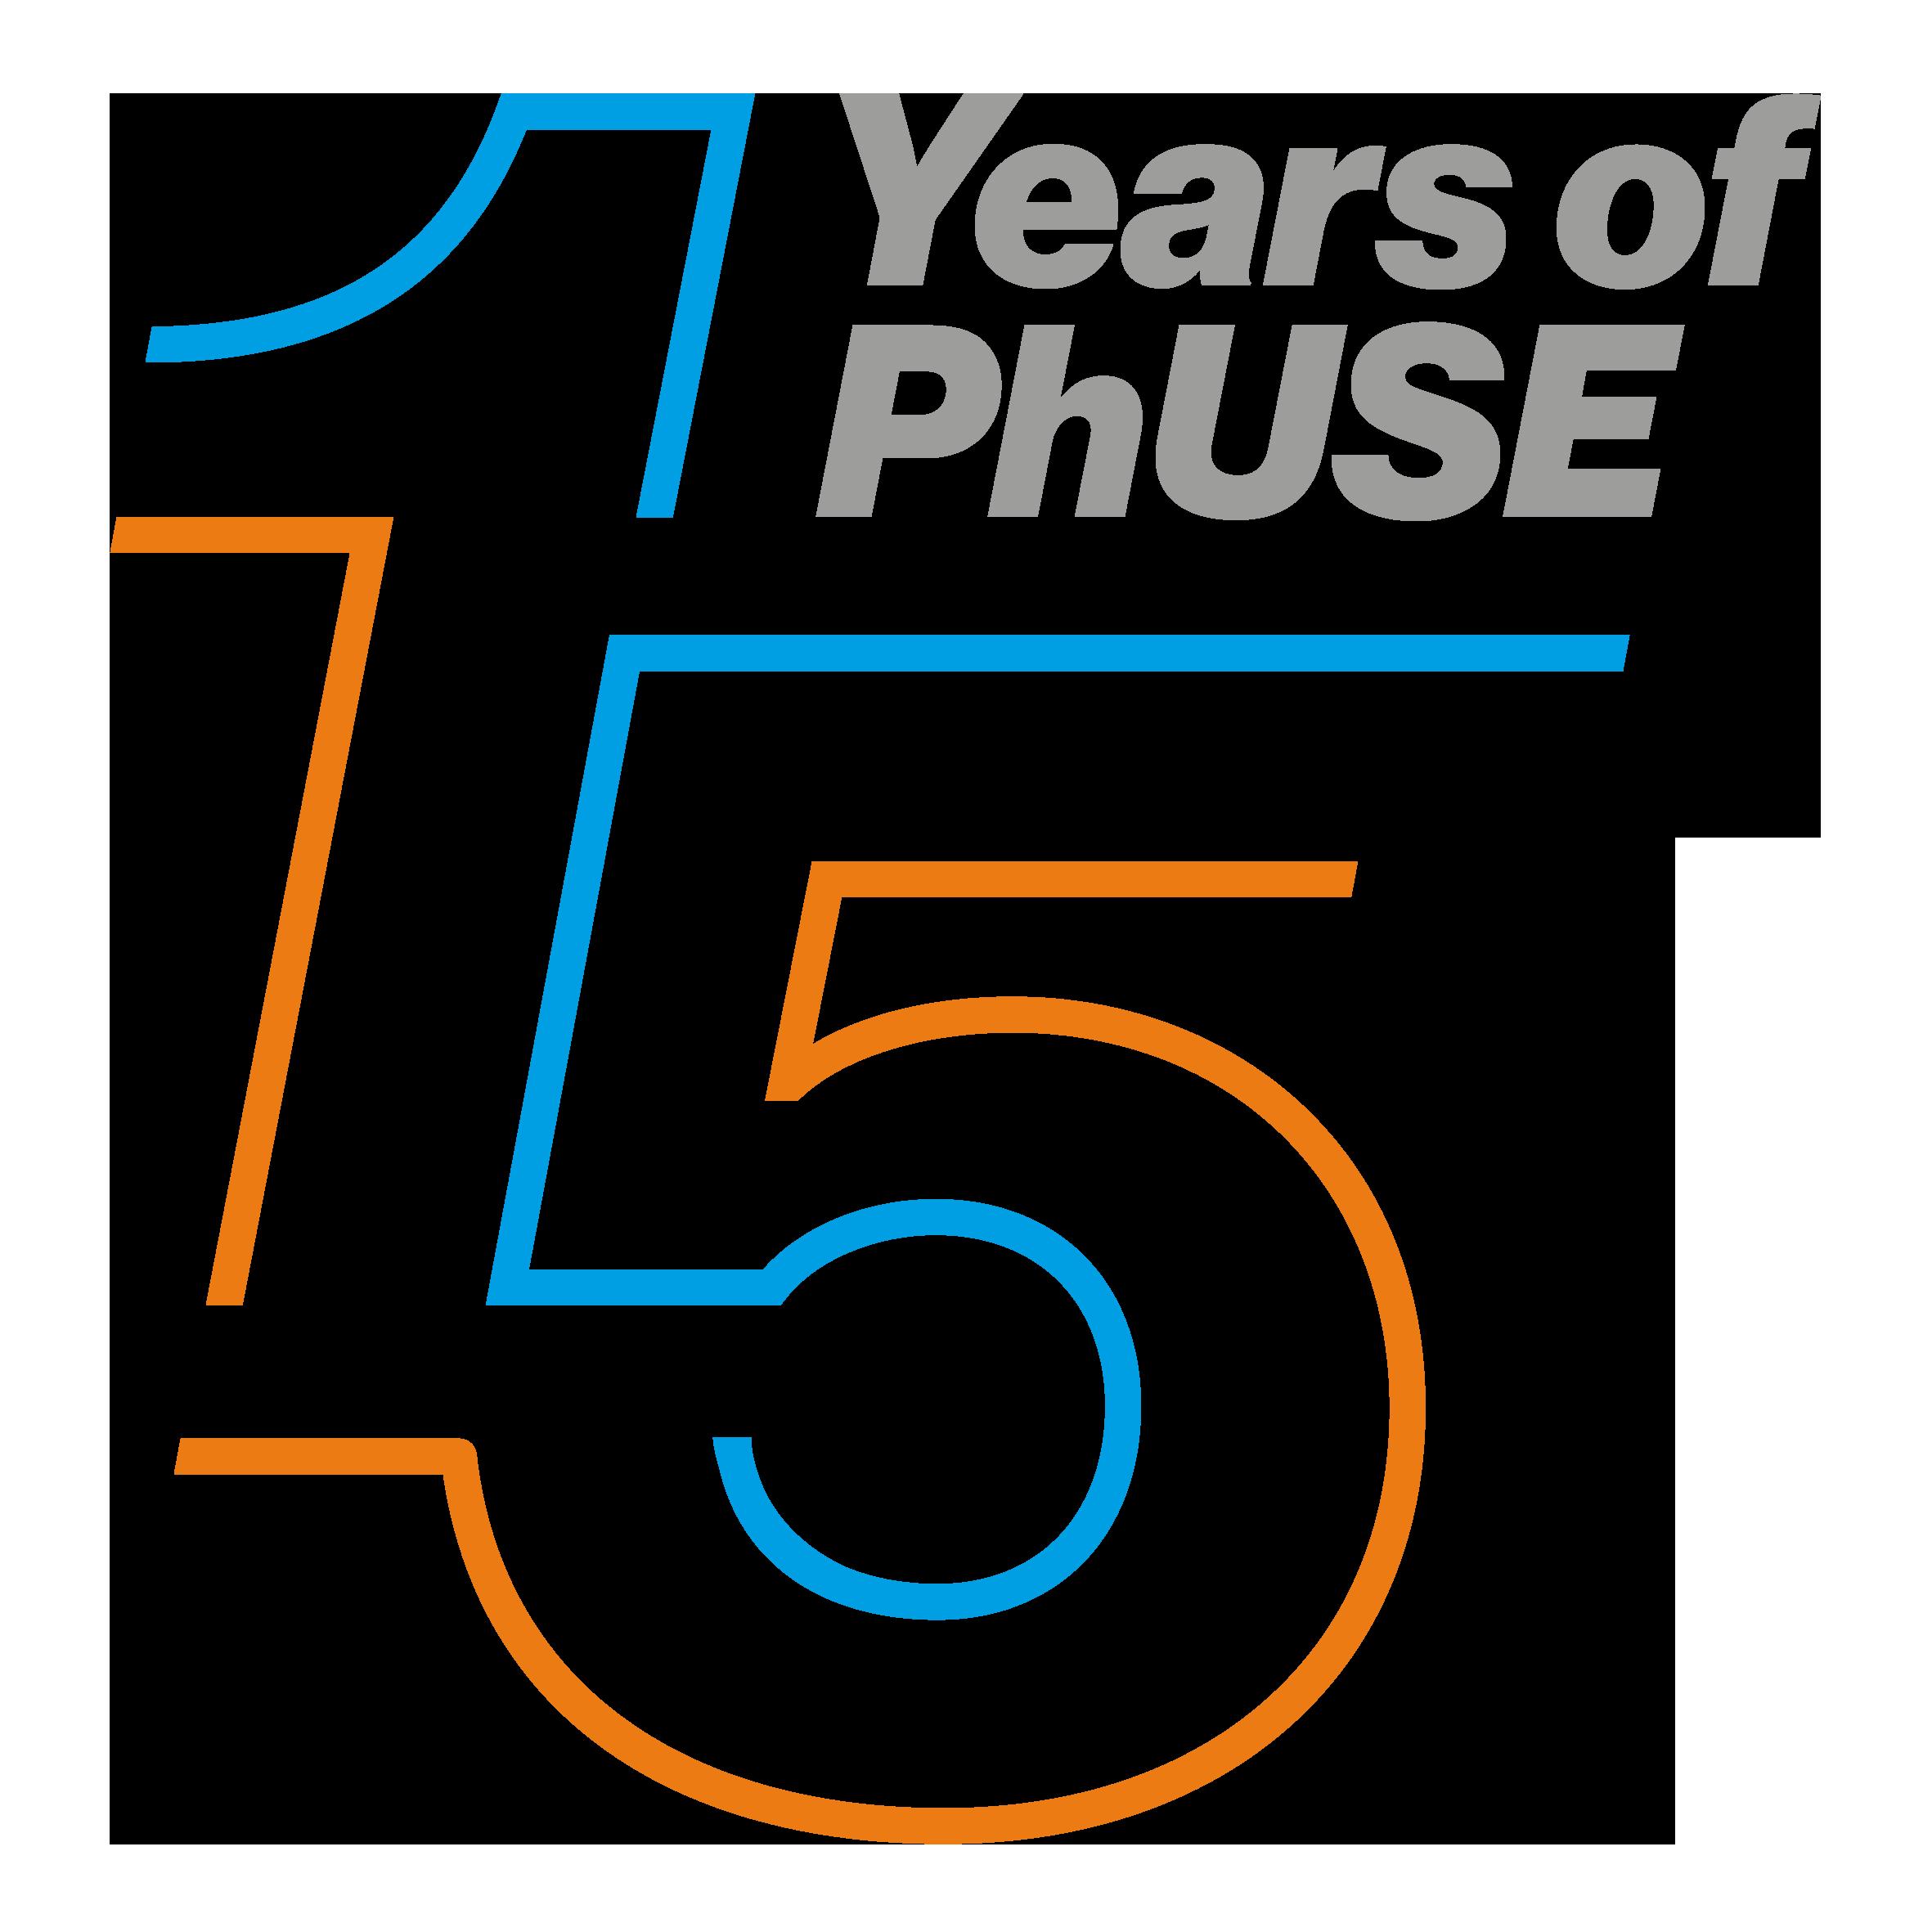 https://campaign-image.com/zohocampaigns/415763000013501004_zc_v366_phuse_15_year_logo_–_blue_orange_–_white_bg.png